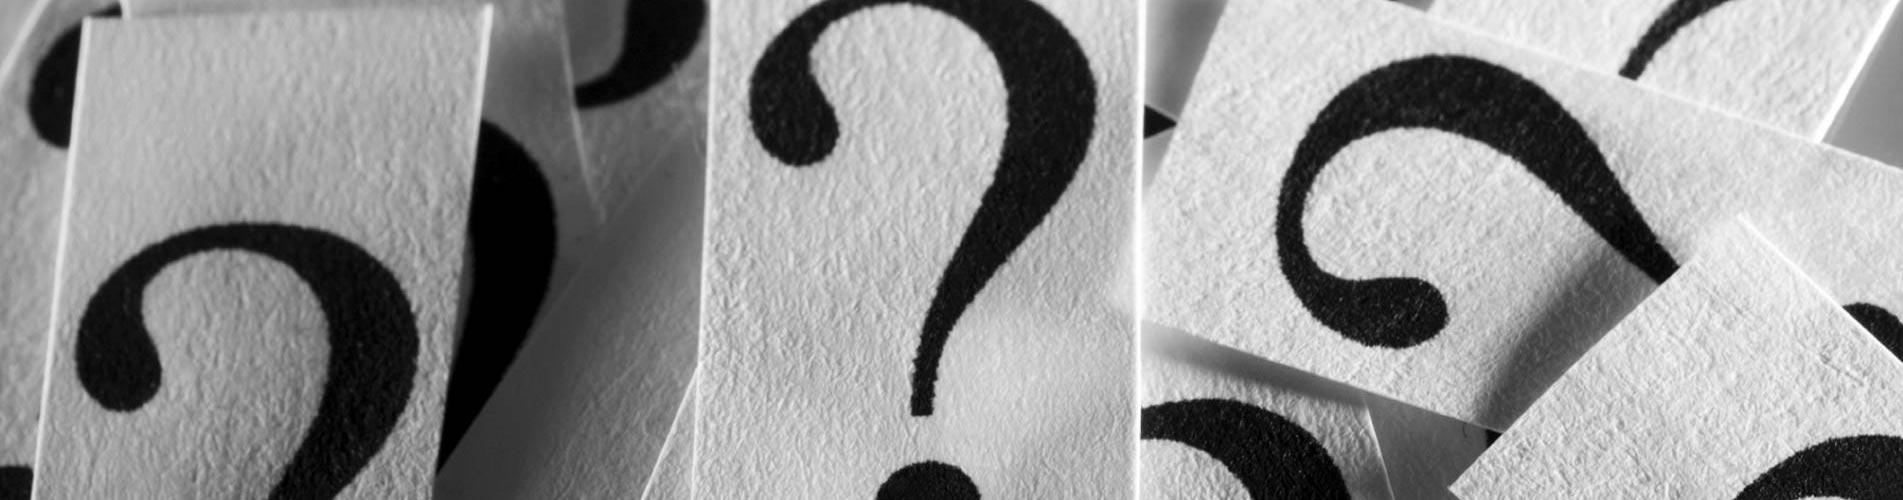 Luxman-light-inner-page-banner-design-FAQ